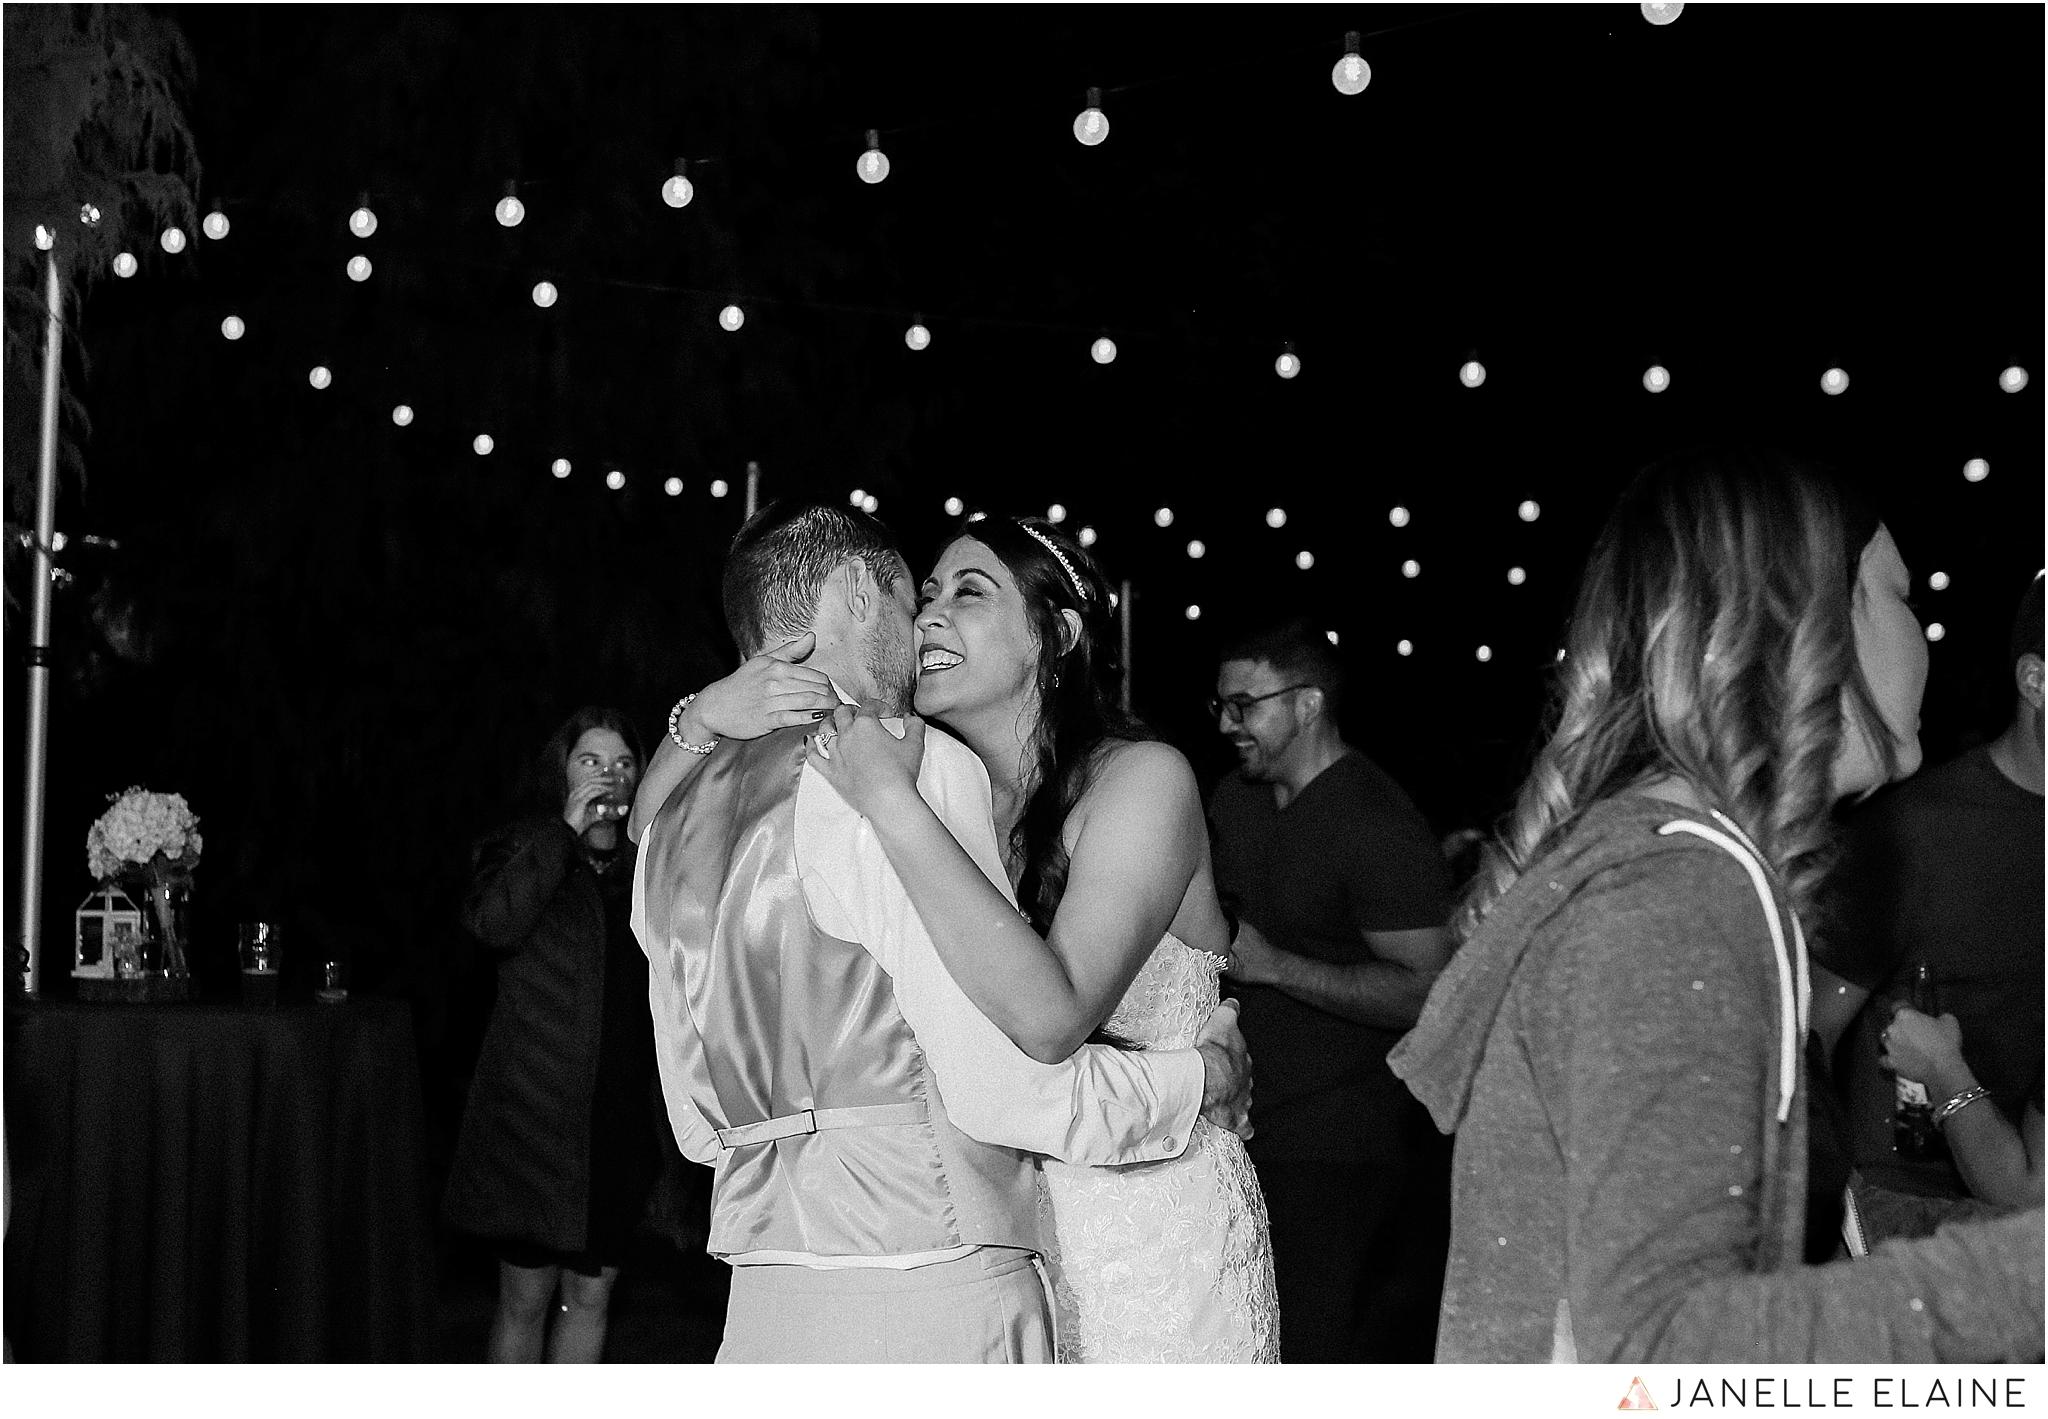 janelle elaine photography-professional wedding photographer-seattle-bellevue-robinswood house-308.jpg